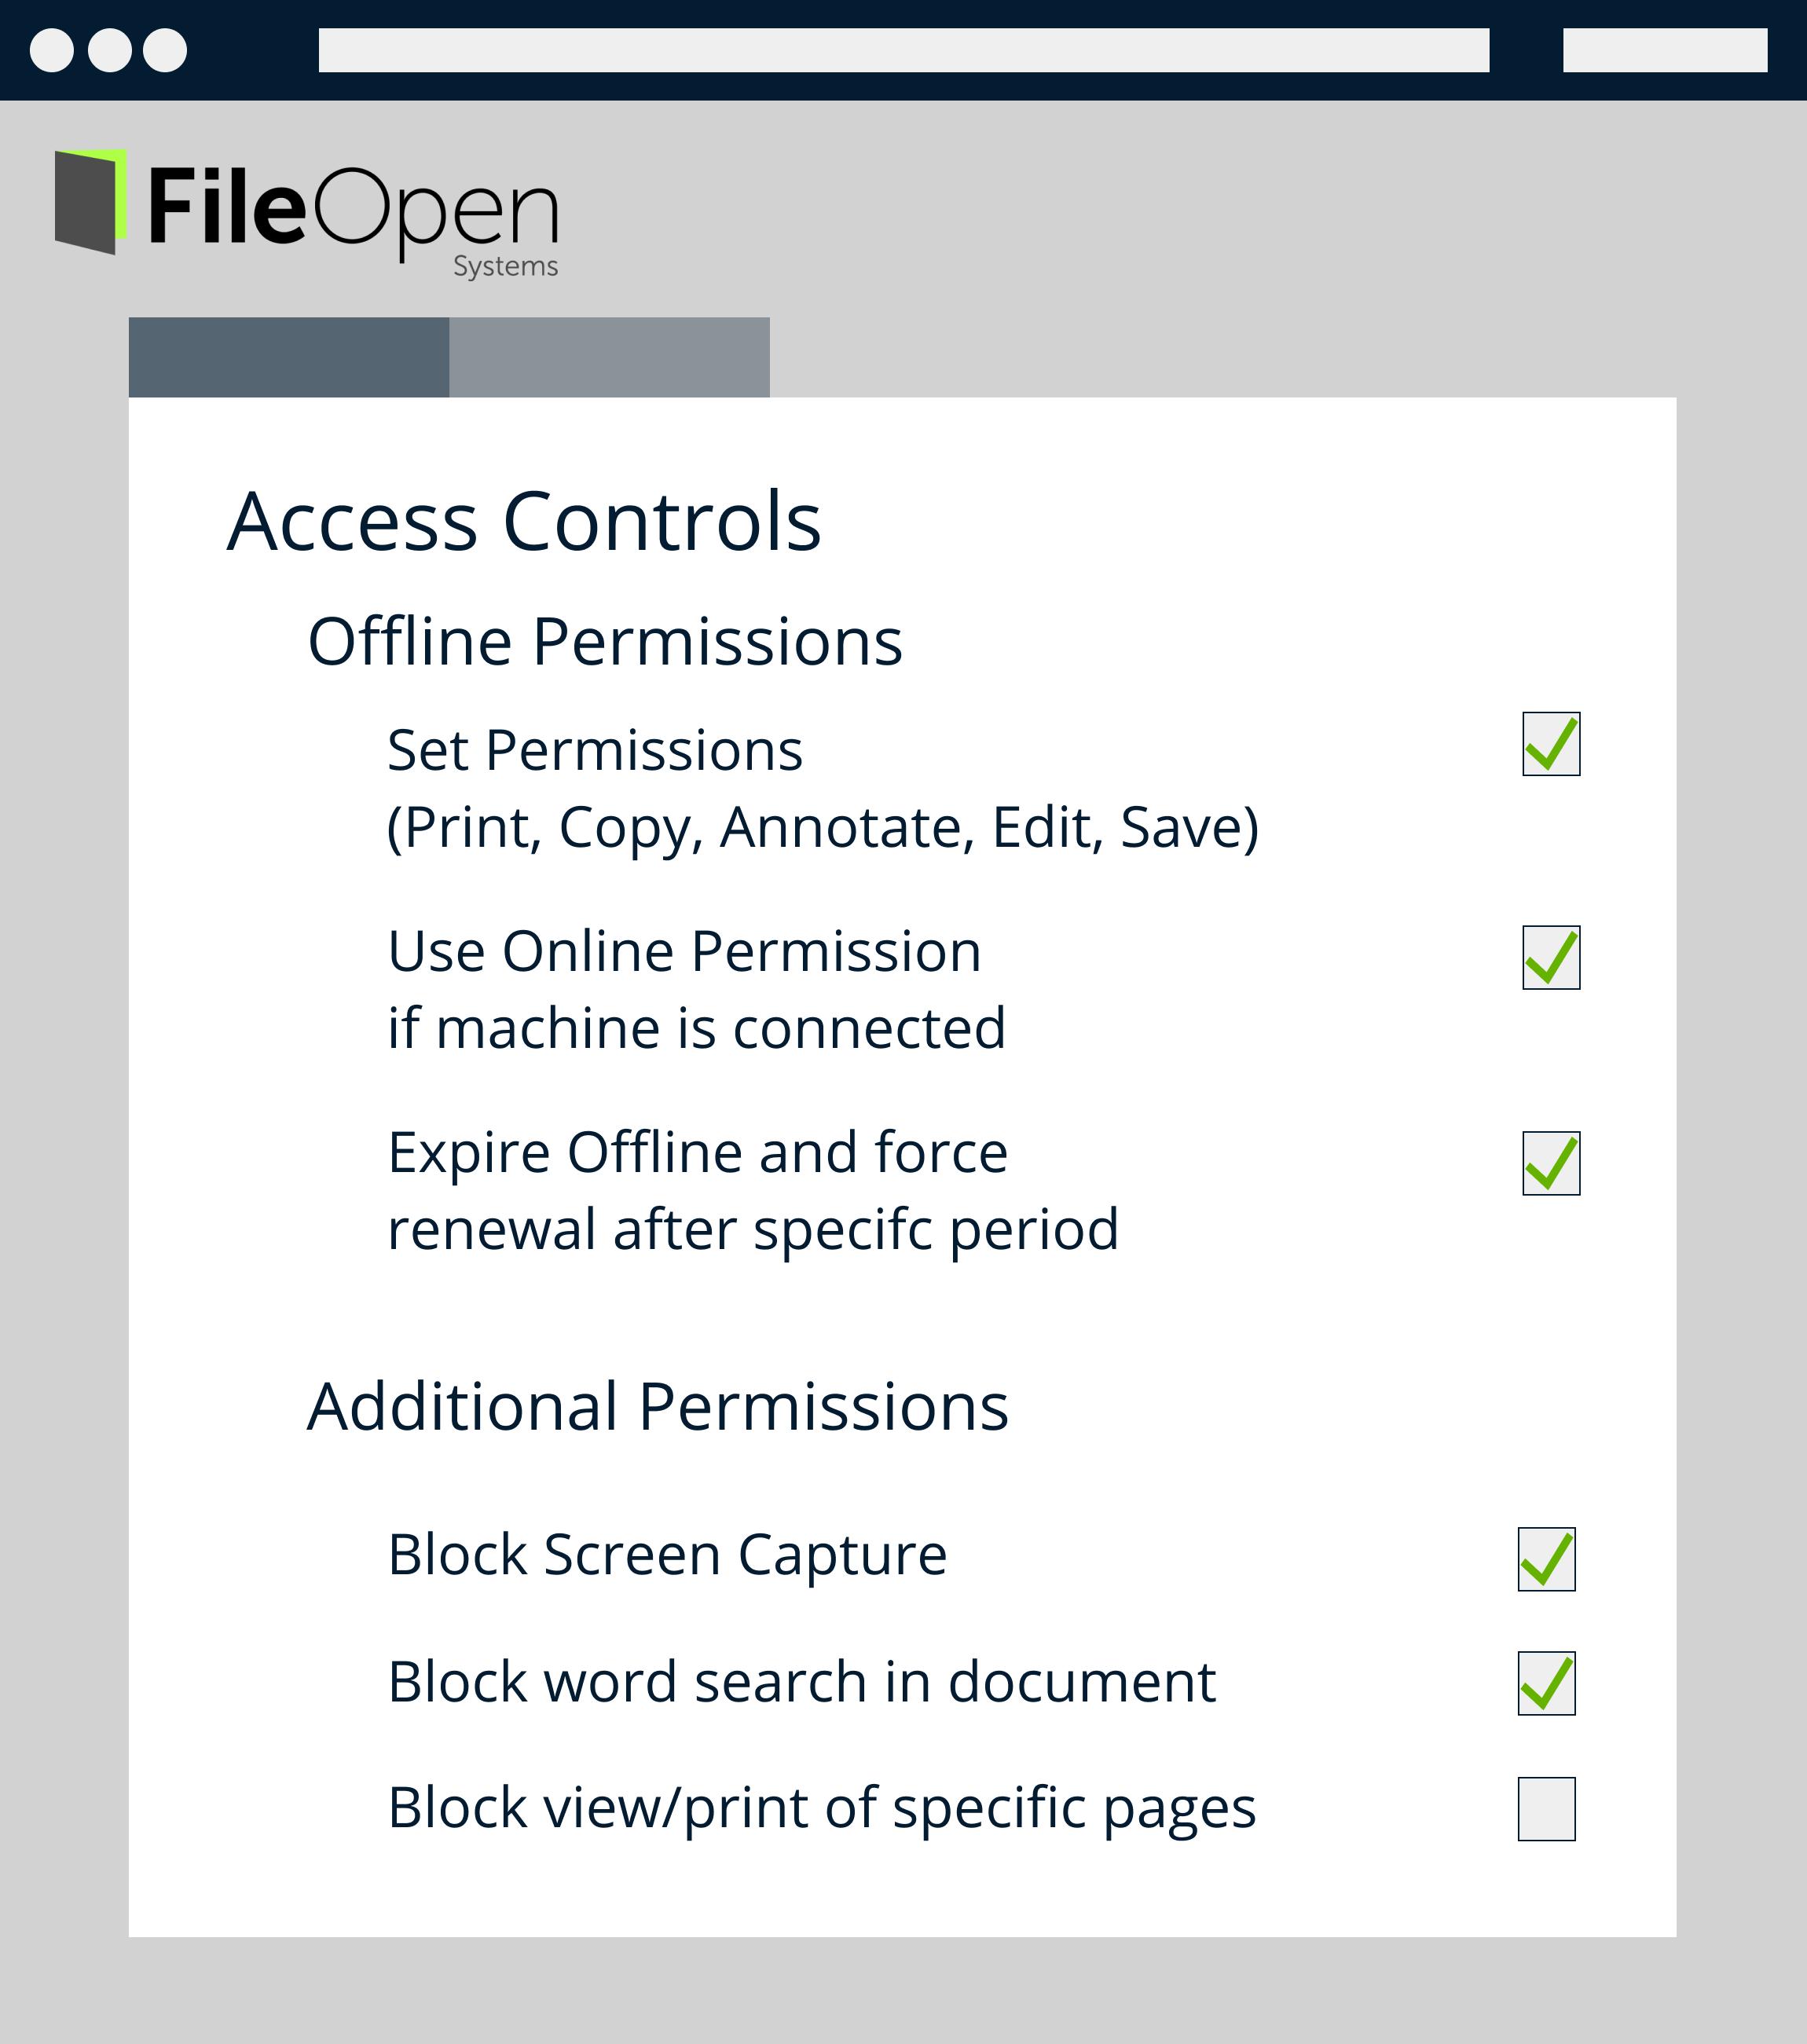 Access Controls - Offline